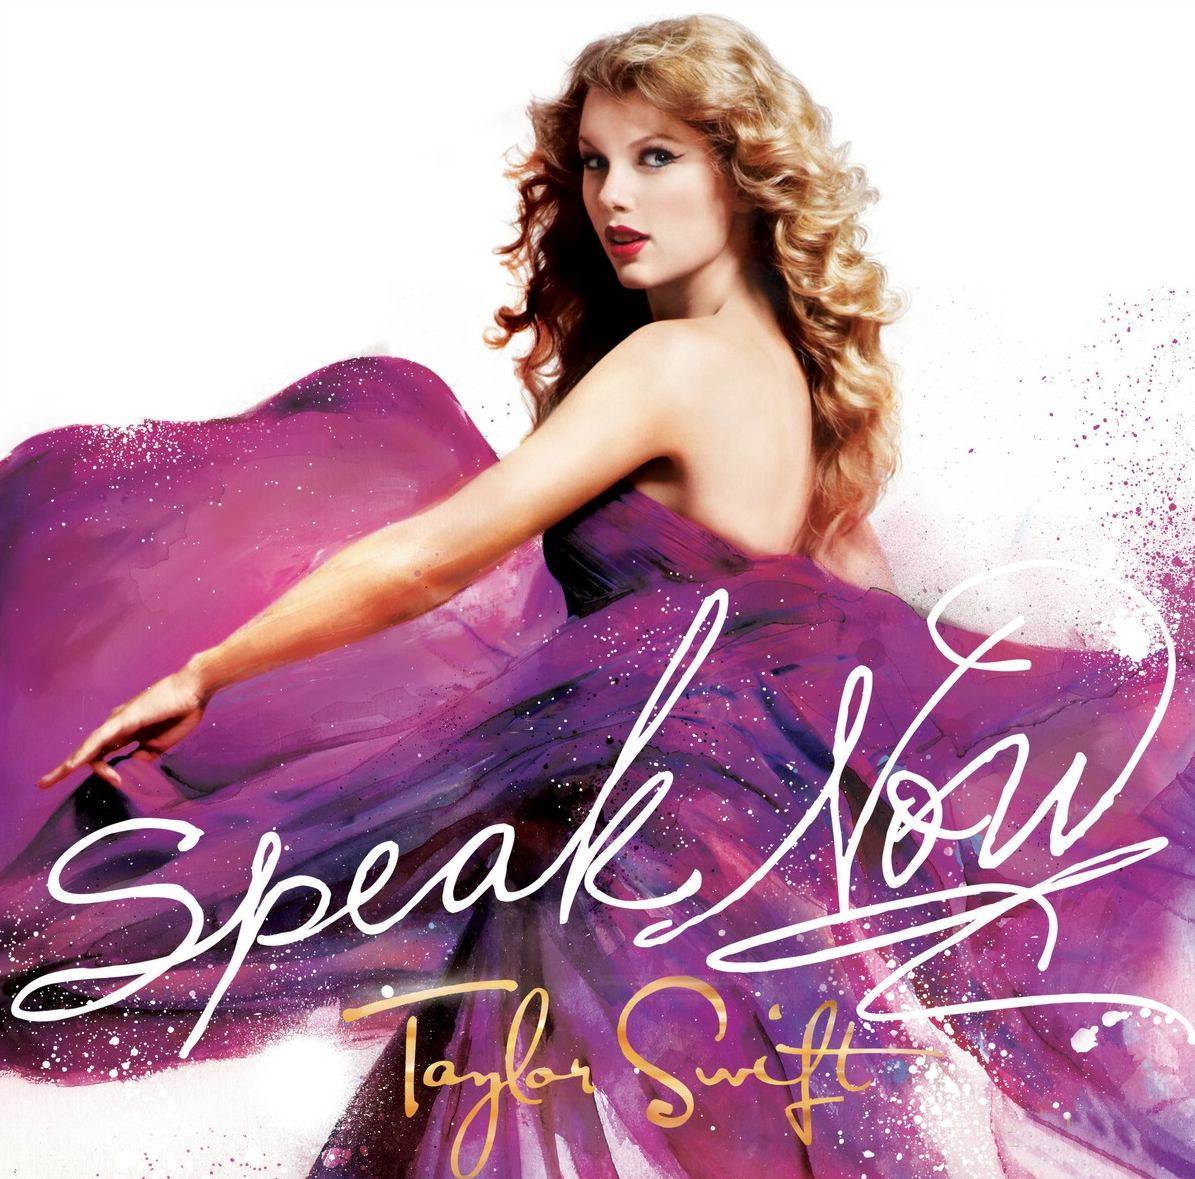 http://2.bp.blogspot.com/-IAh8KzYoocA/Tc2M-dwxebI/AAAAAAAAAKQ/5BZ_AVUFj9g/s1600/taylor-swift-speak-now-01.jpg